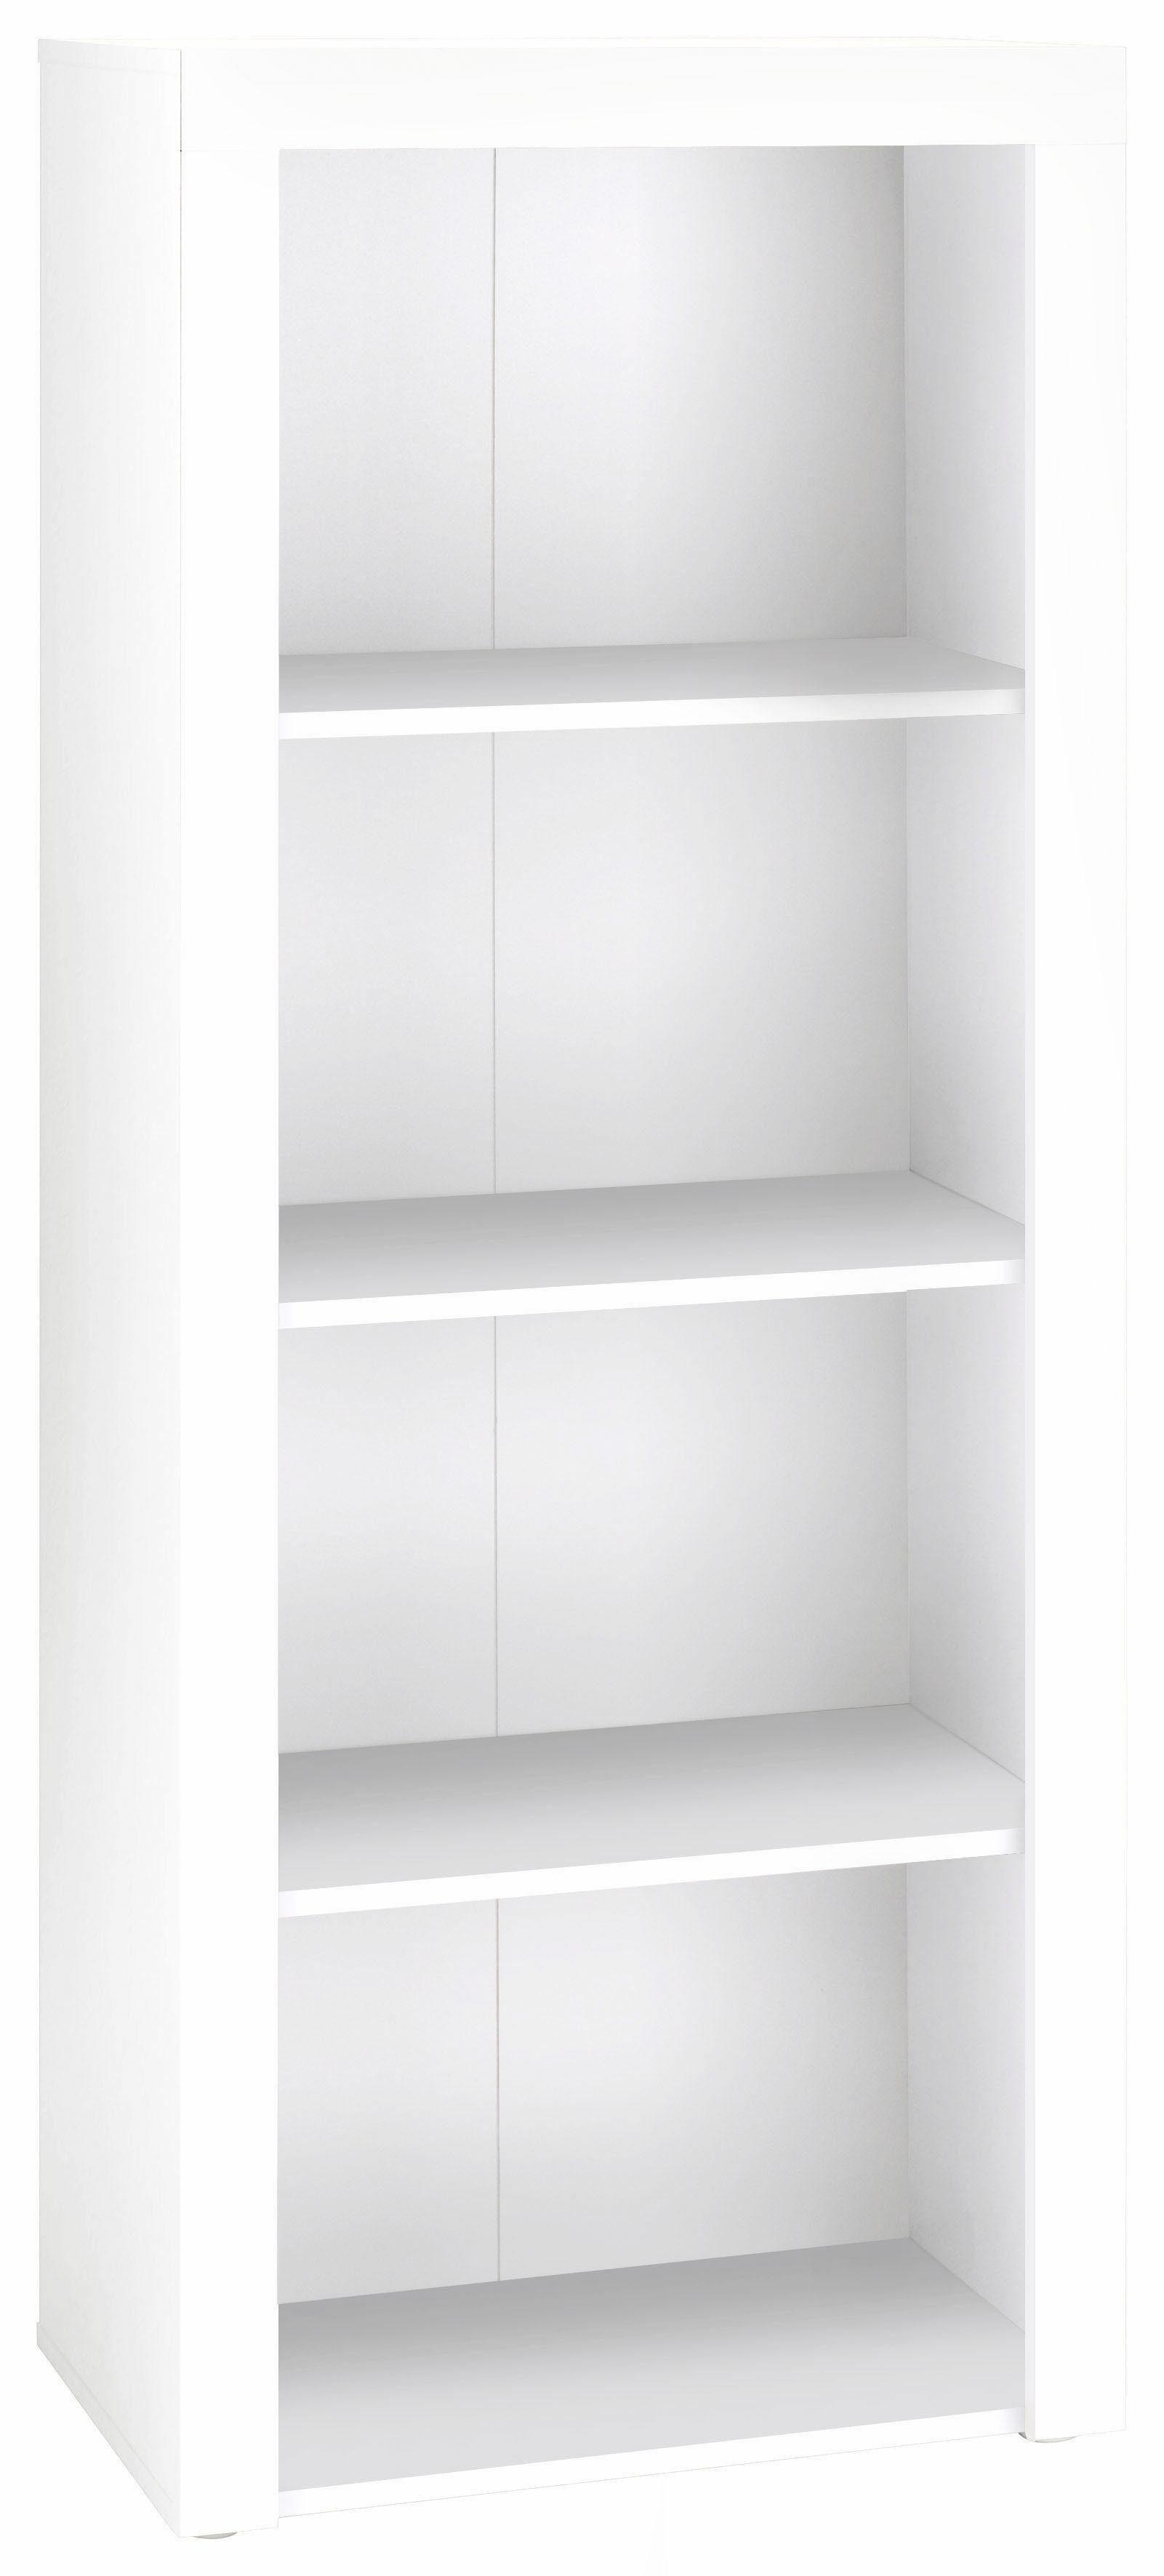 B x H x T 60 x 75 x 30 cm Regal Bücherregal Stauraumregal Büroregal weiss ca